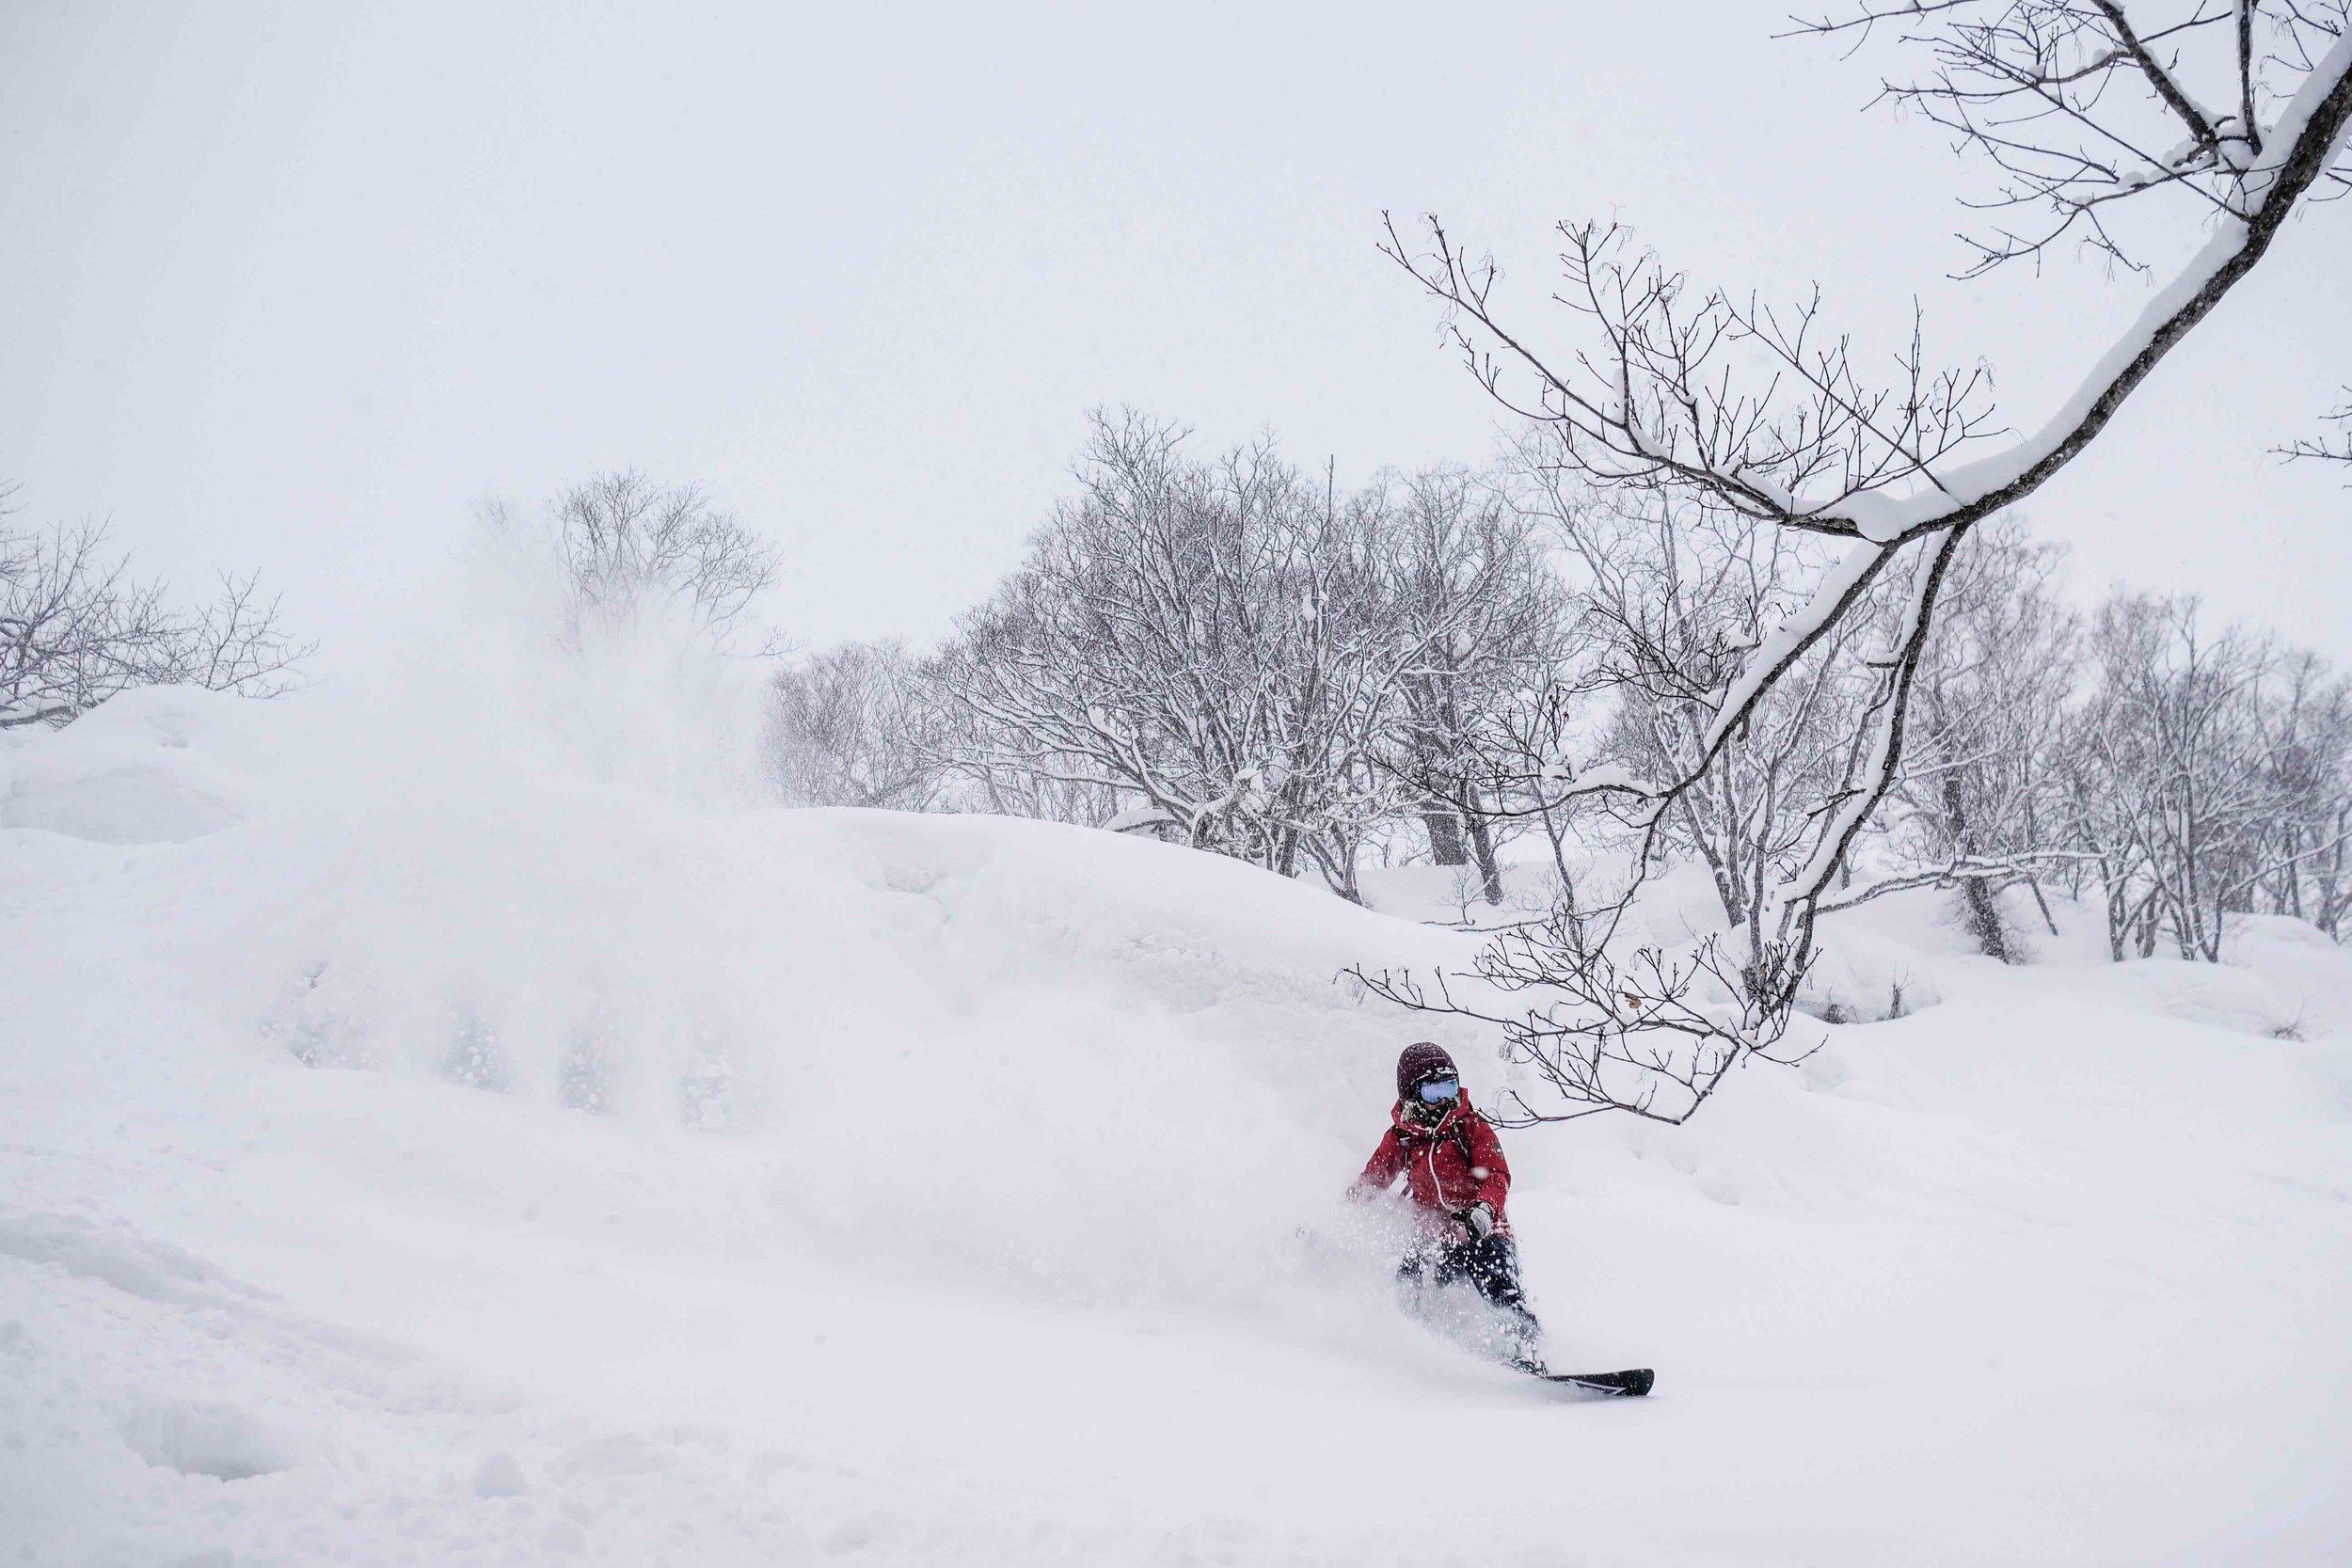 BPRSNT CHANELLE SLADICS SNOWBOARDING JAPAN POWDER 8.jpg